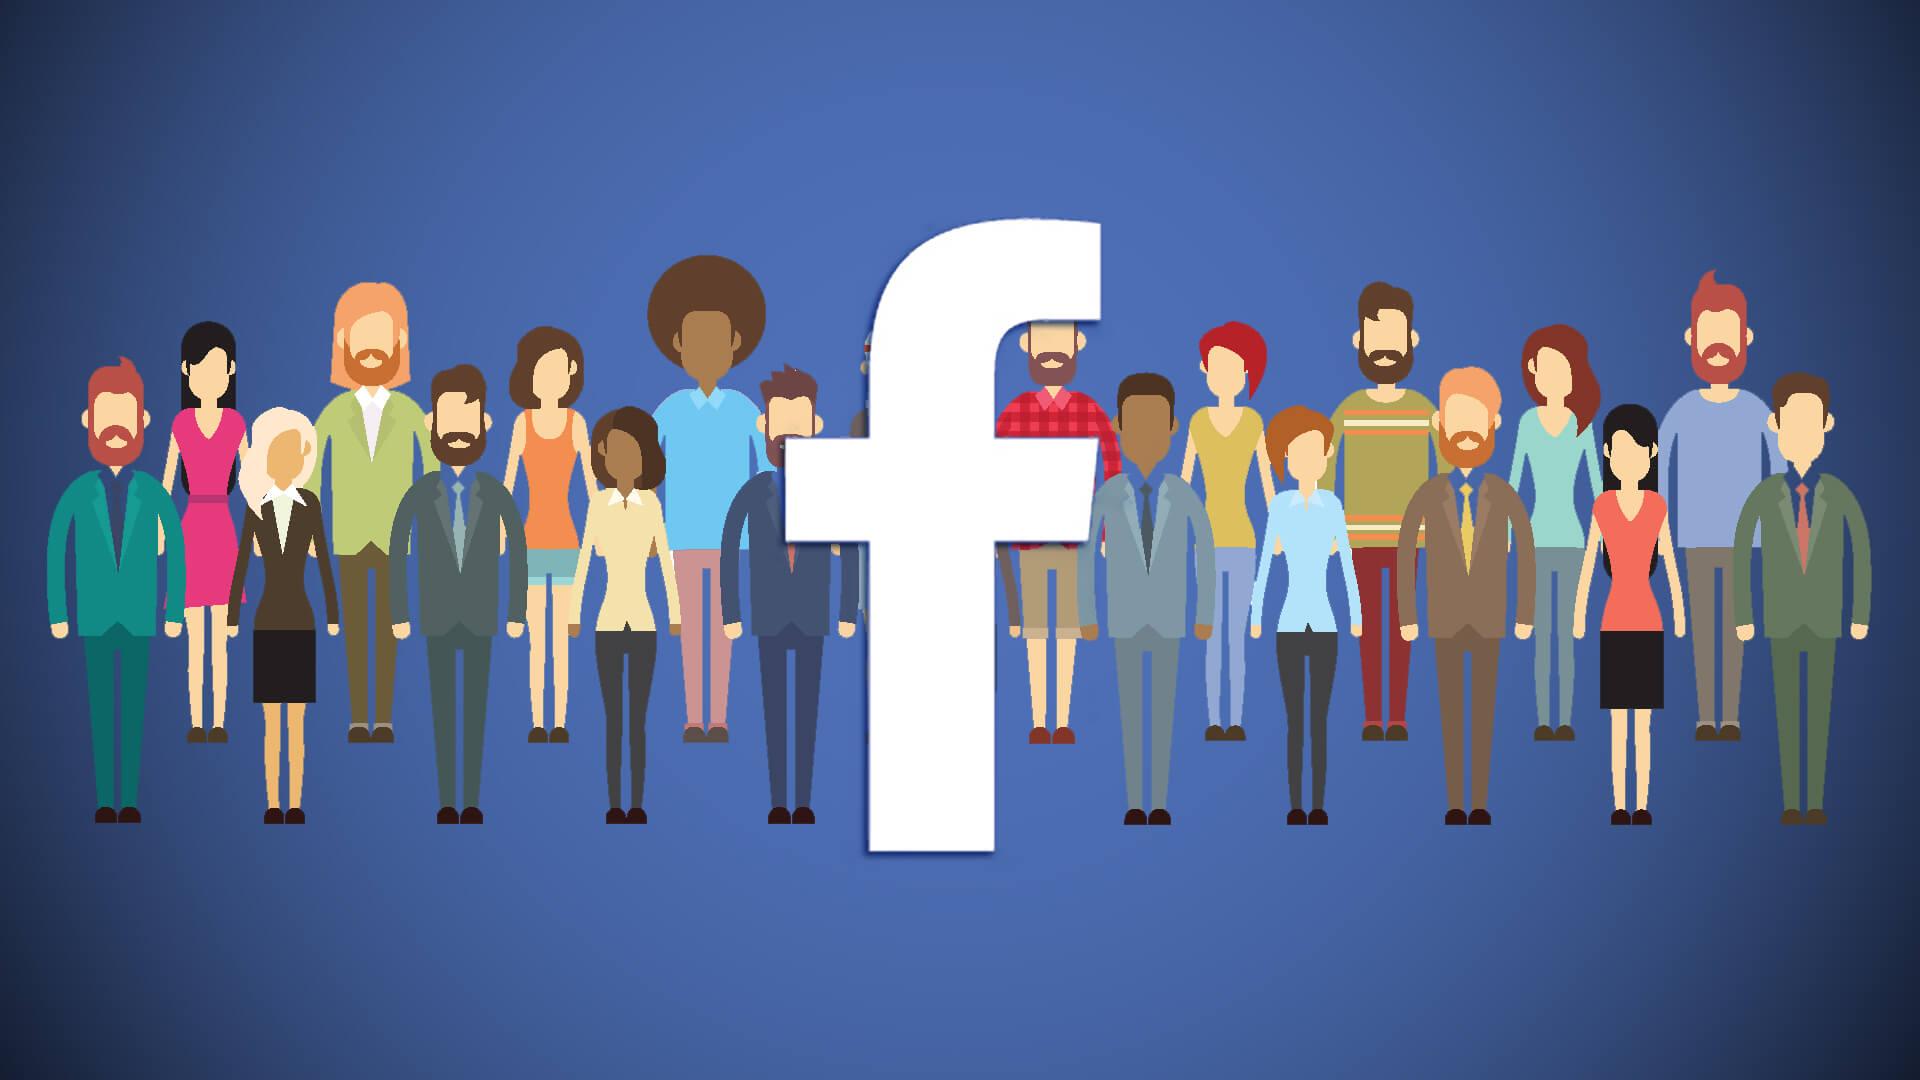 konnyebben-tudunk-majd-embereket-megjelolni-facebook-bejegyz_m4se.jpg